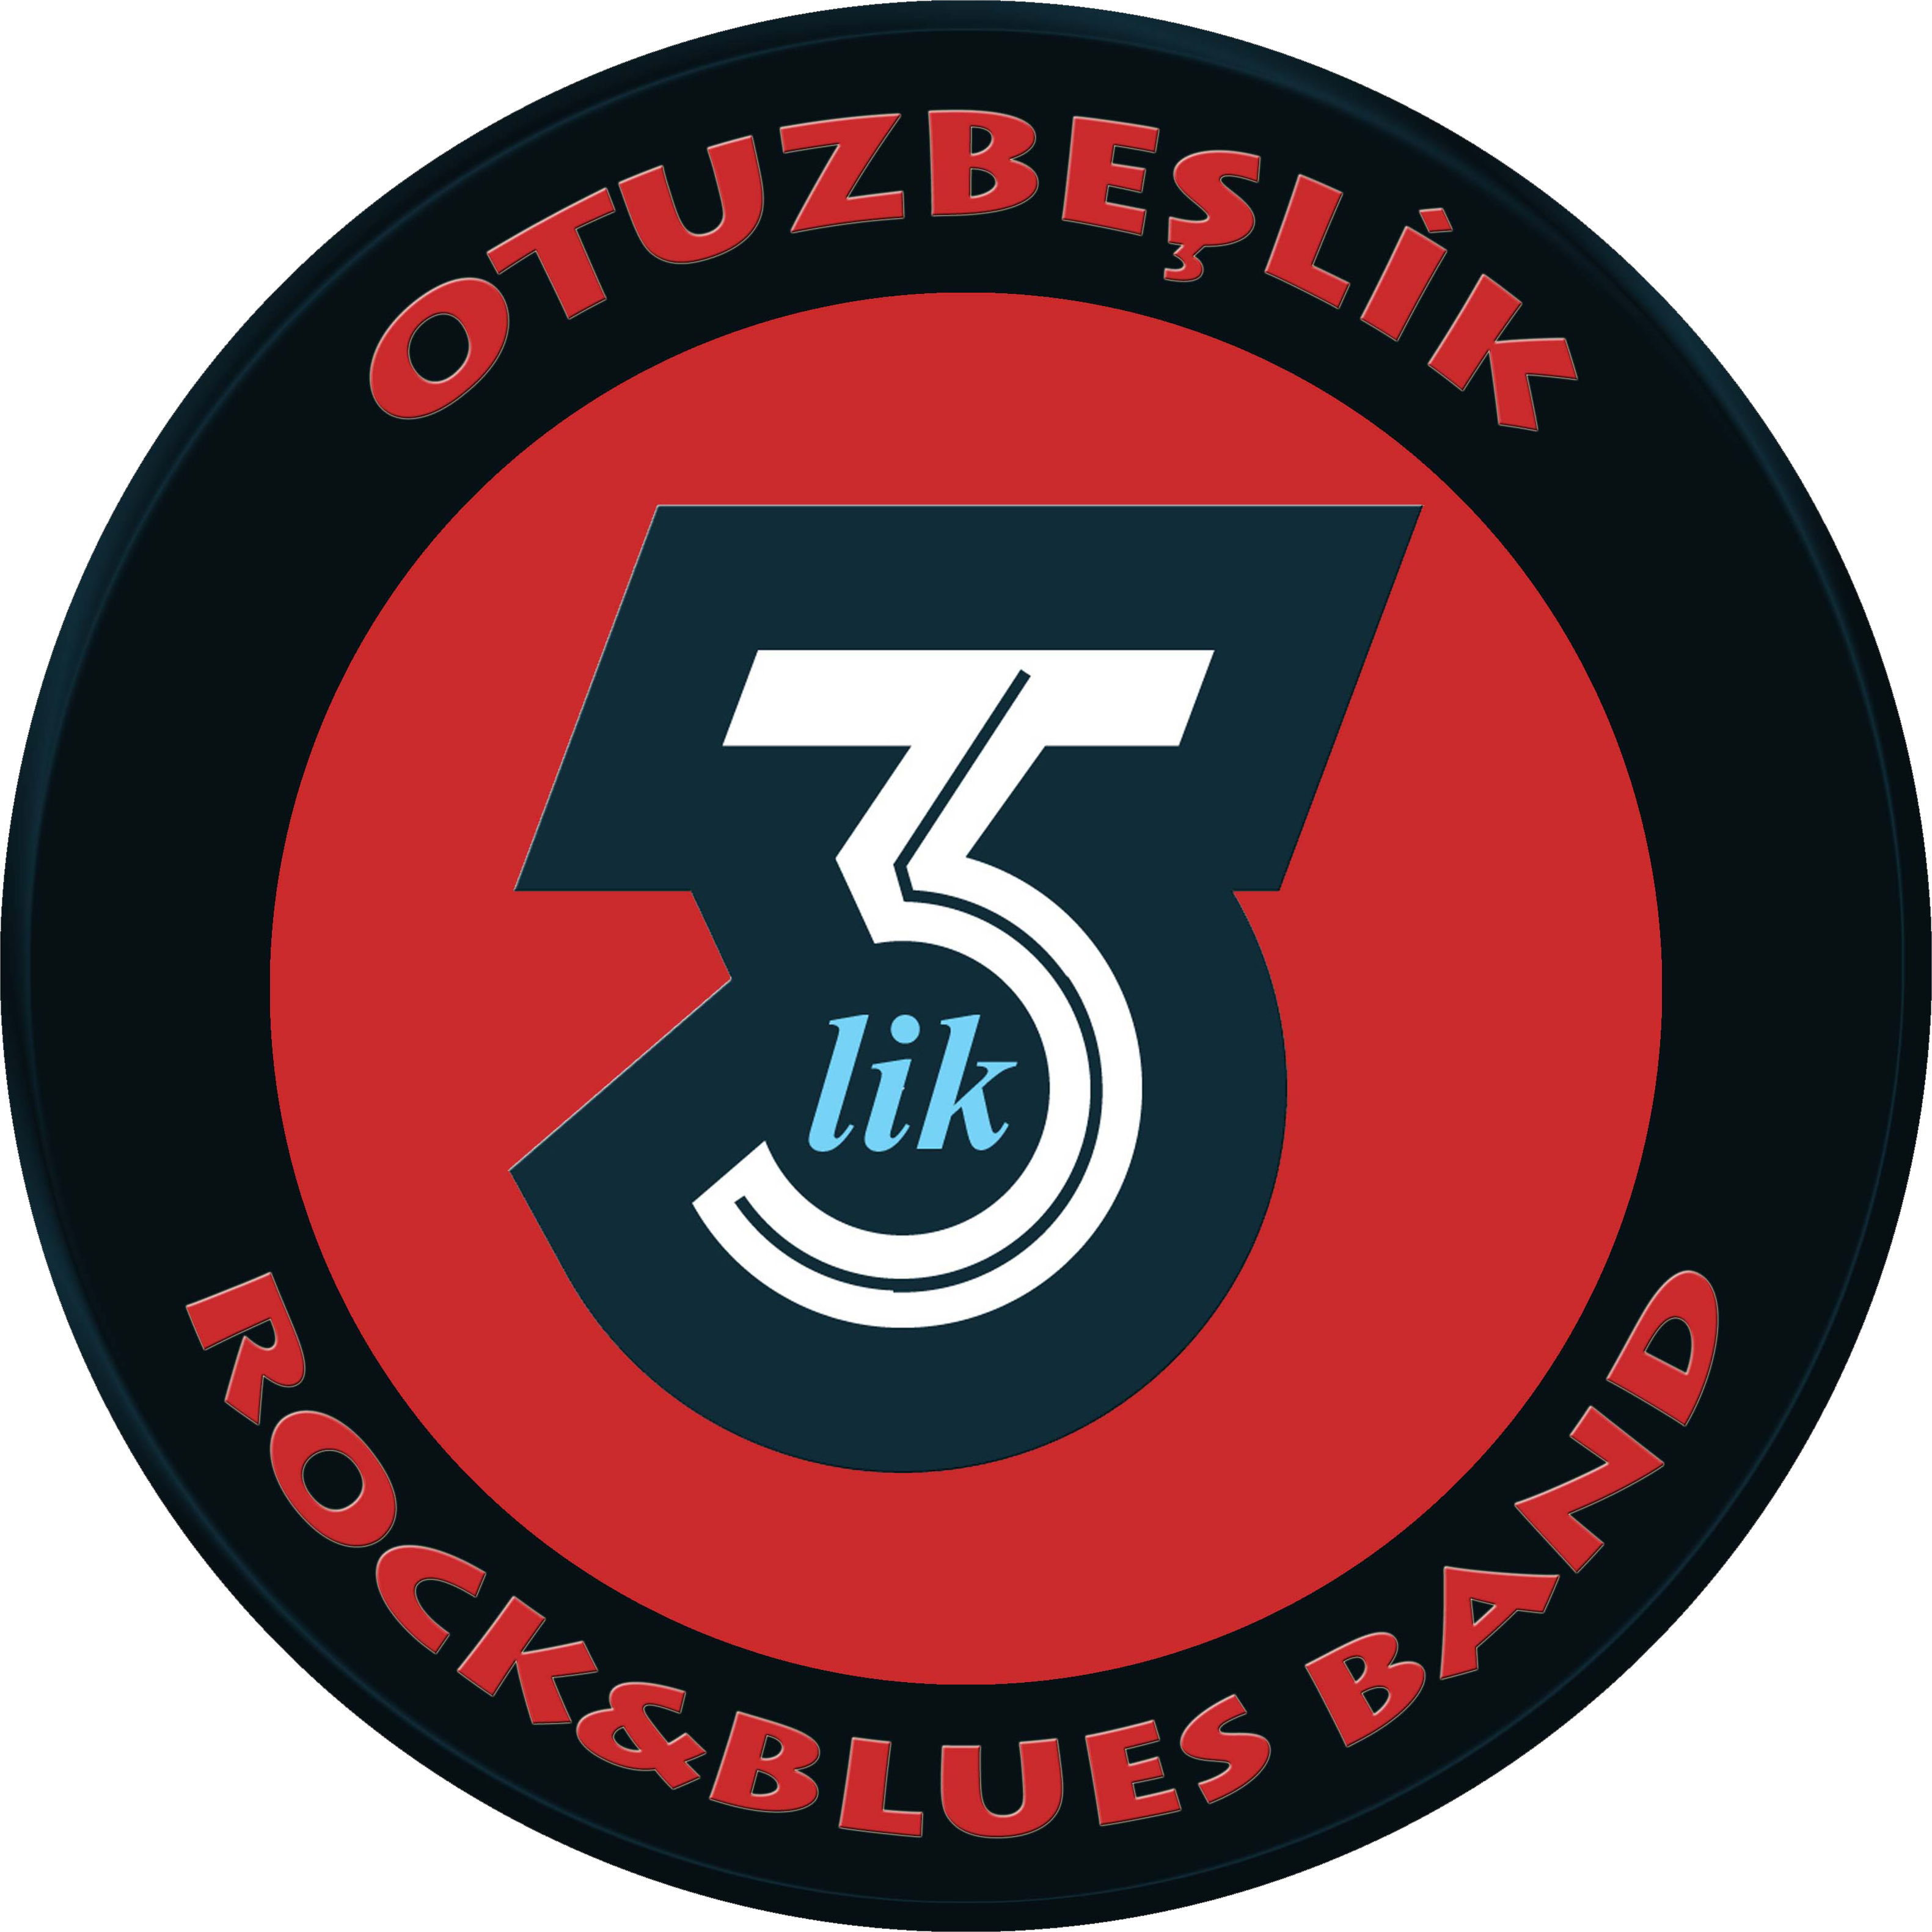 otuzbeşlik logo